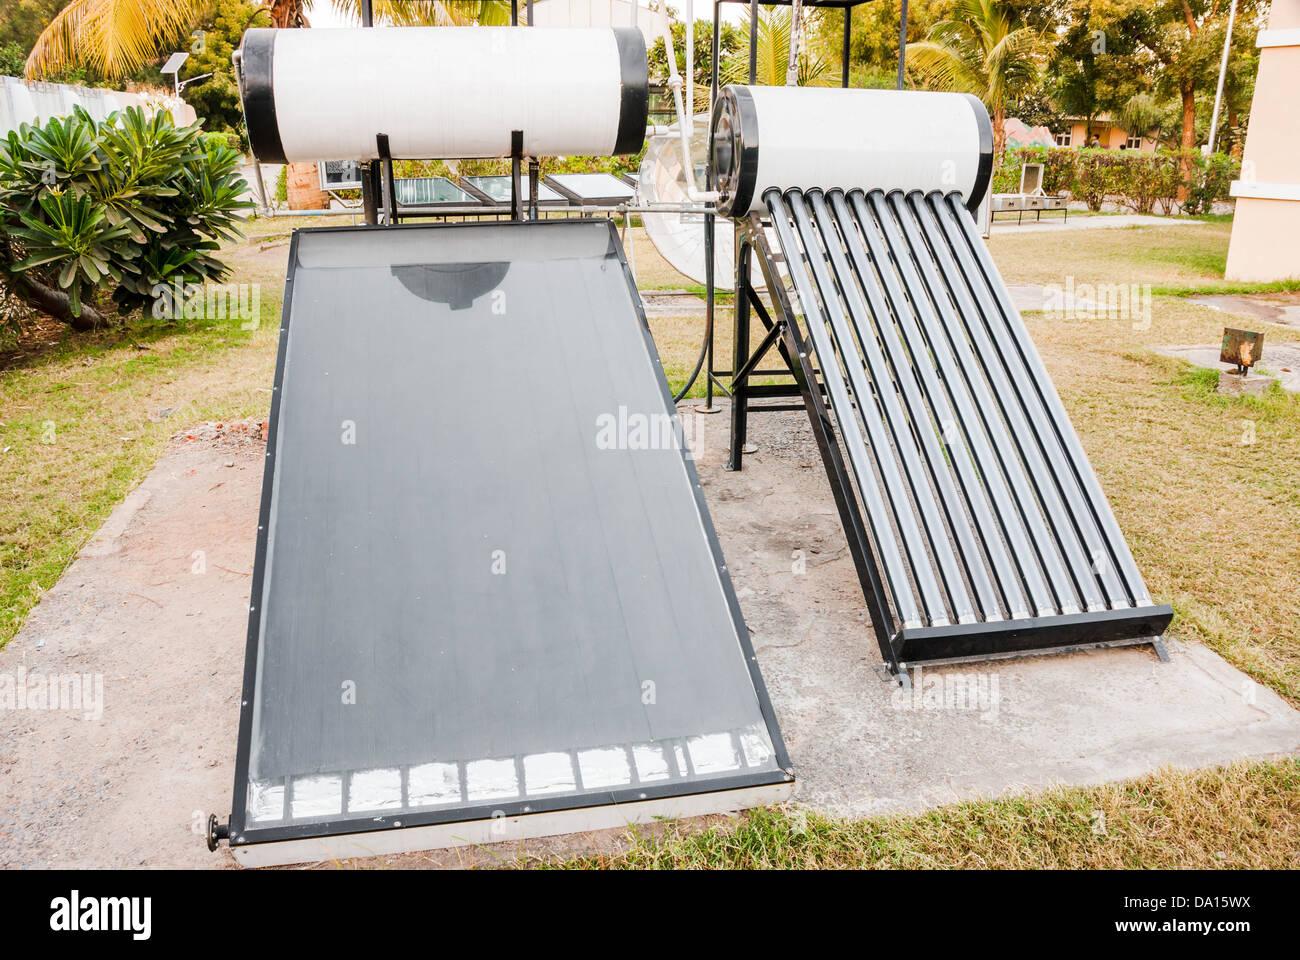 solar water heaters utilizing solar energy. Green Energy symbol - Stock Image